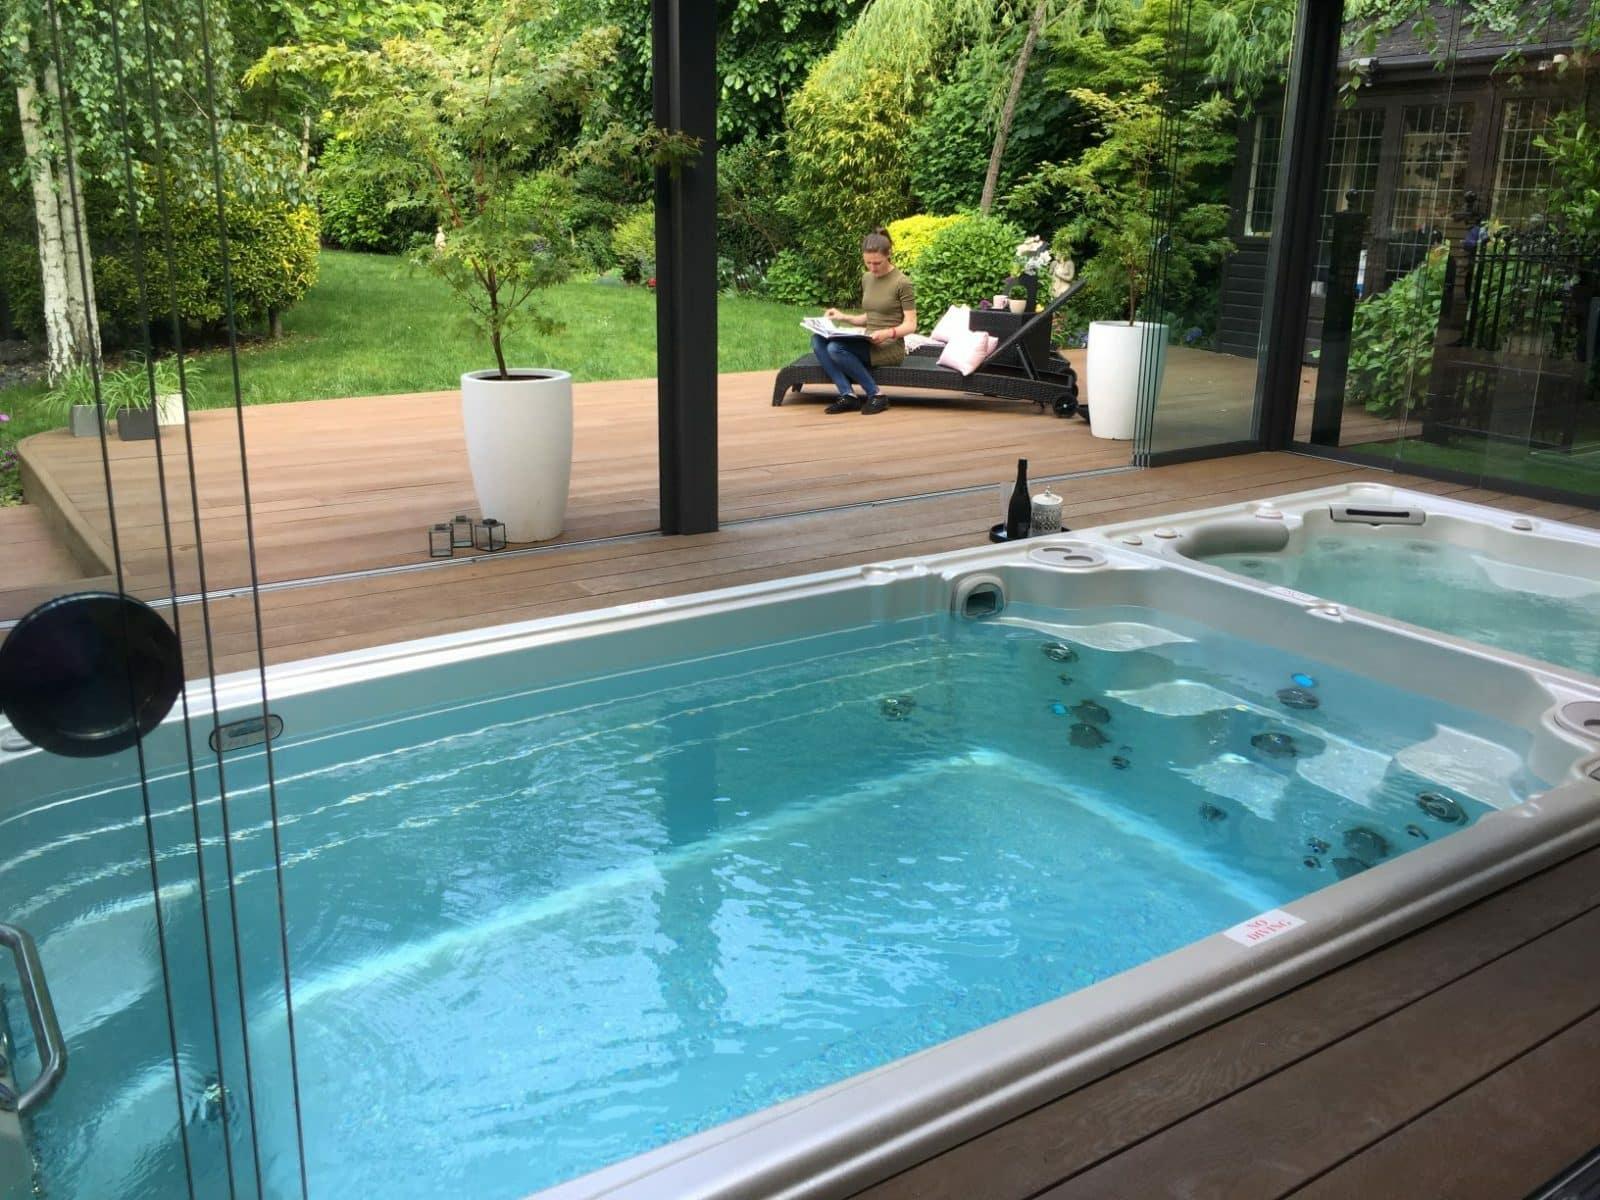 visit our award winning hot tub showroom at the london. Black Bedroom Furniture Sets. Home Design Ideas